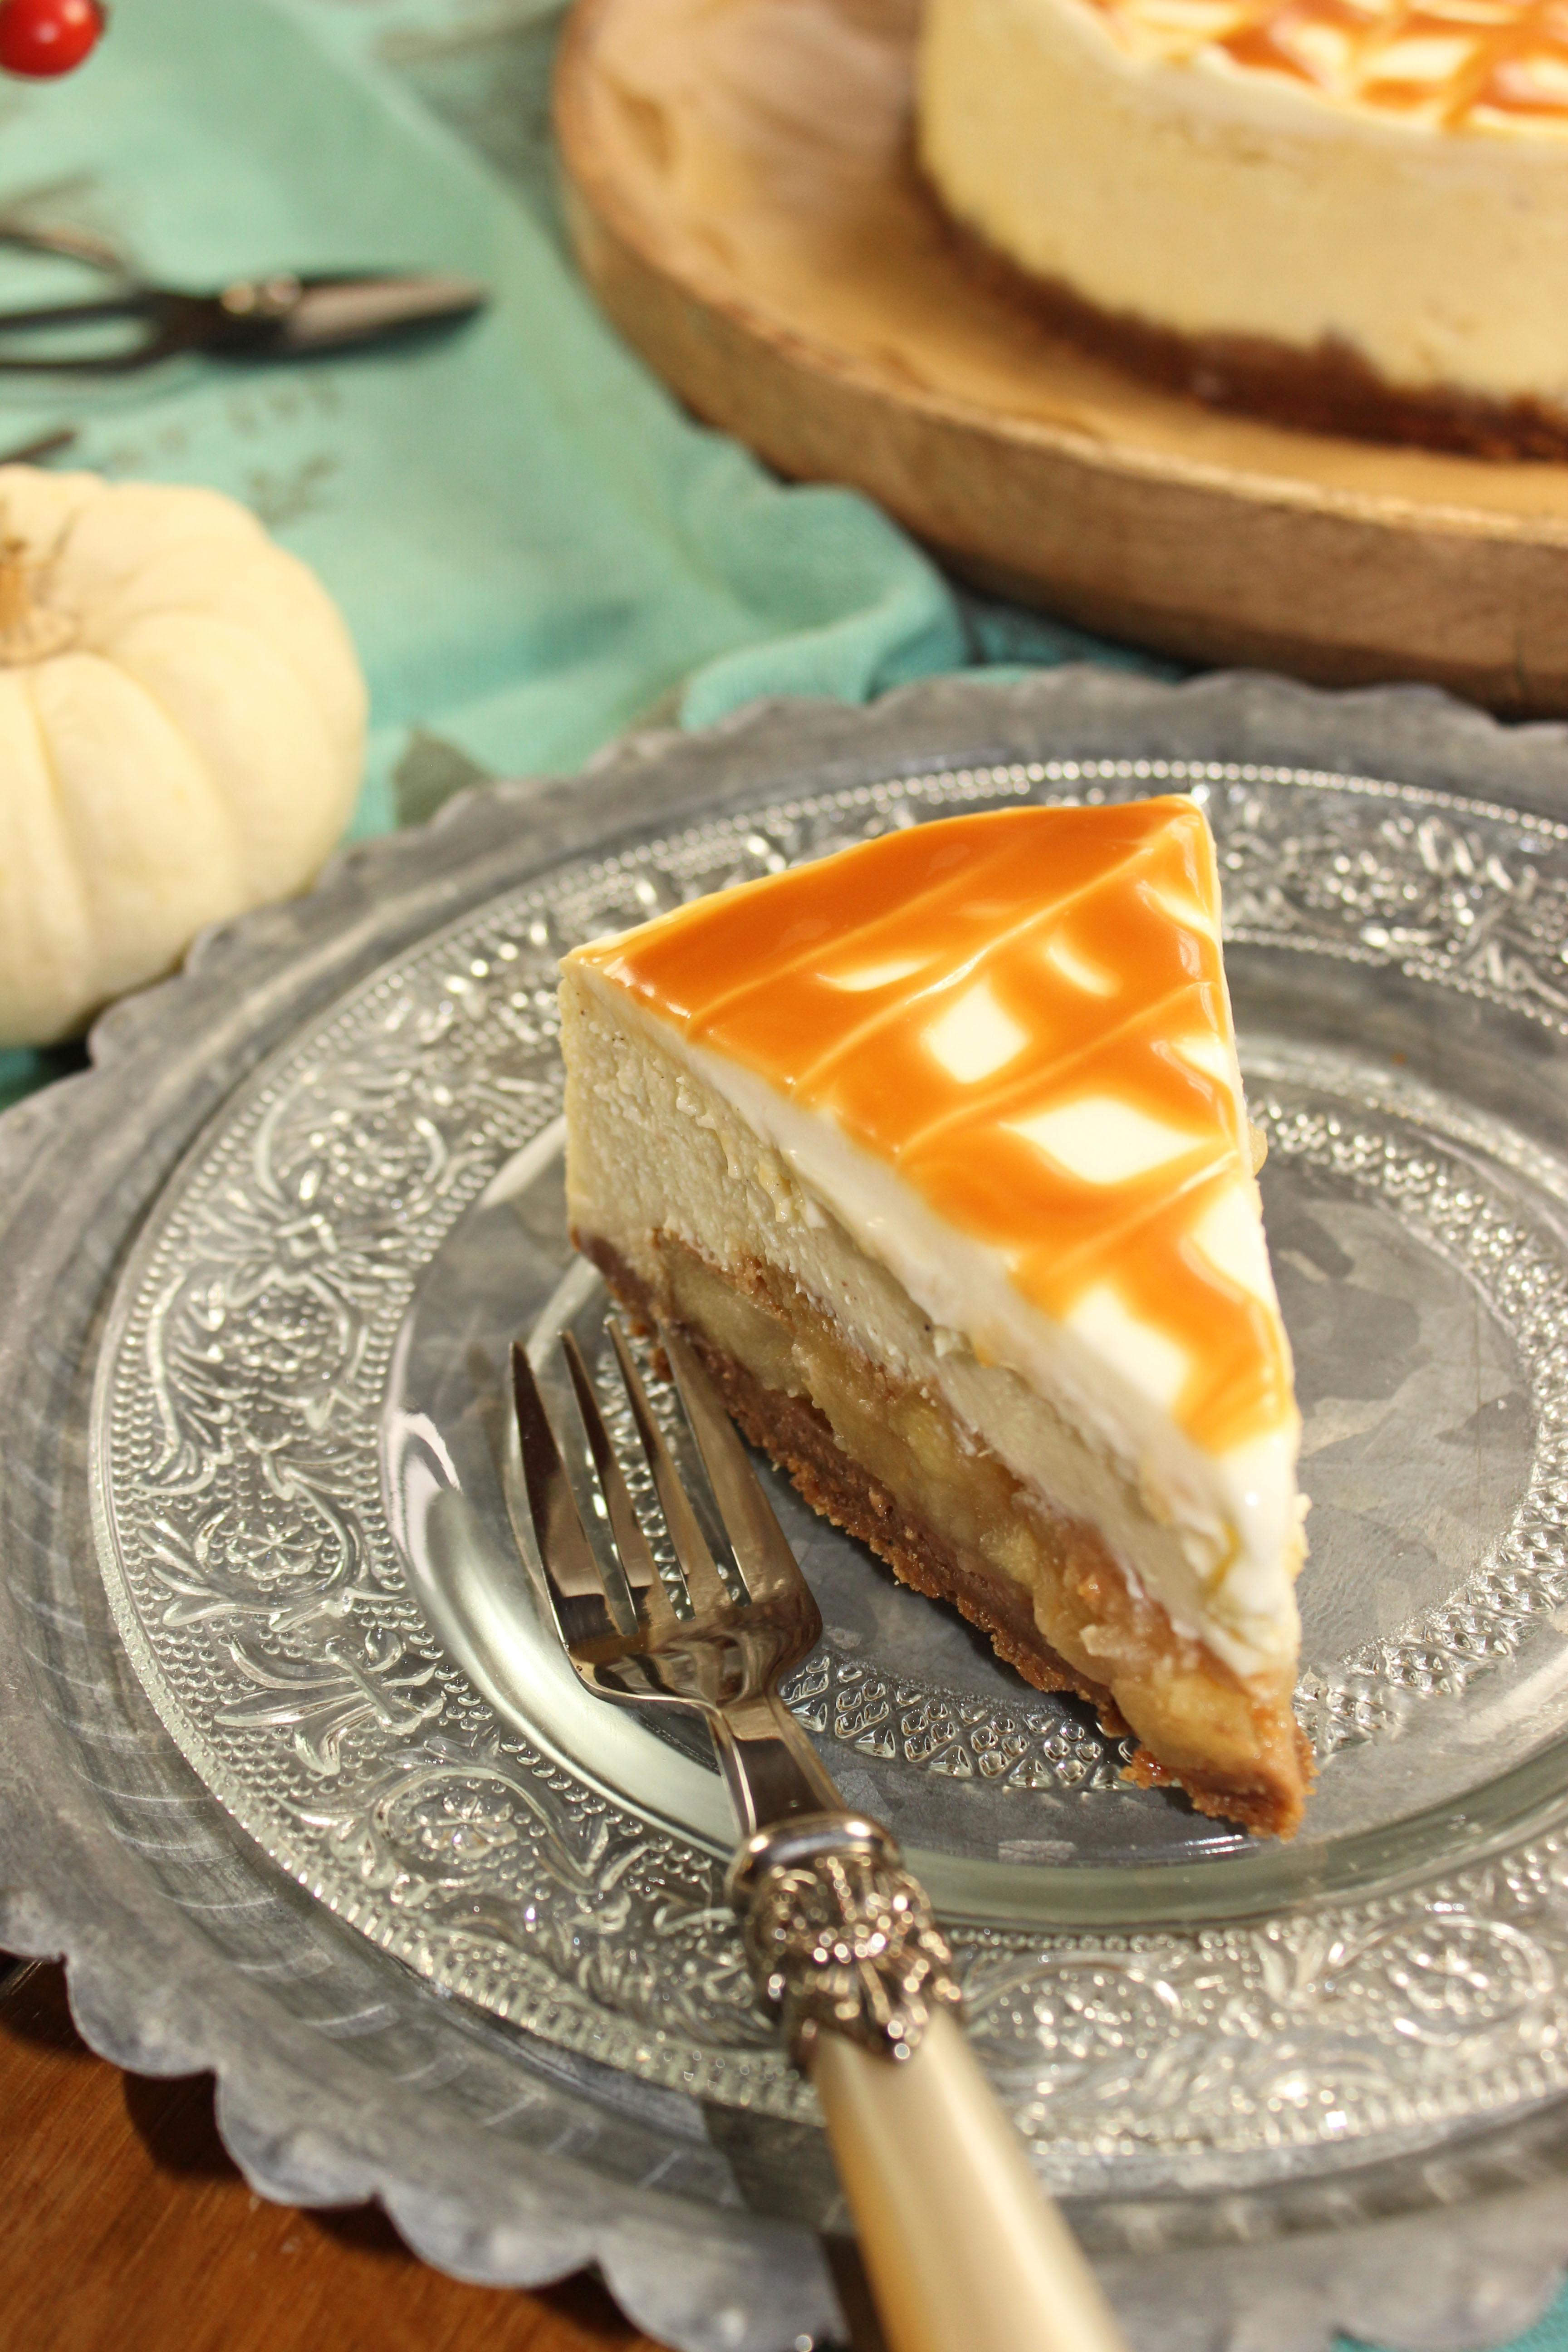 Karamell-Apfel-Cheesecake_b4464